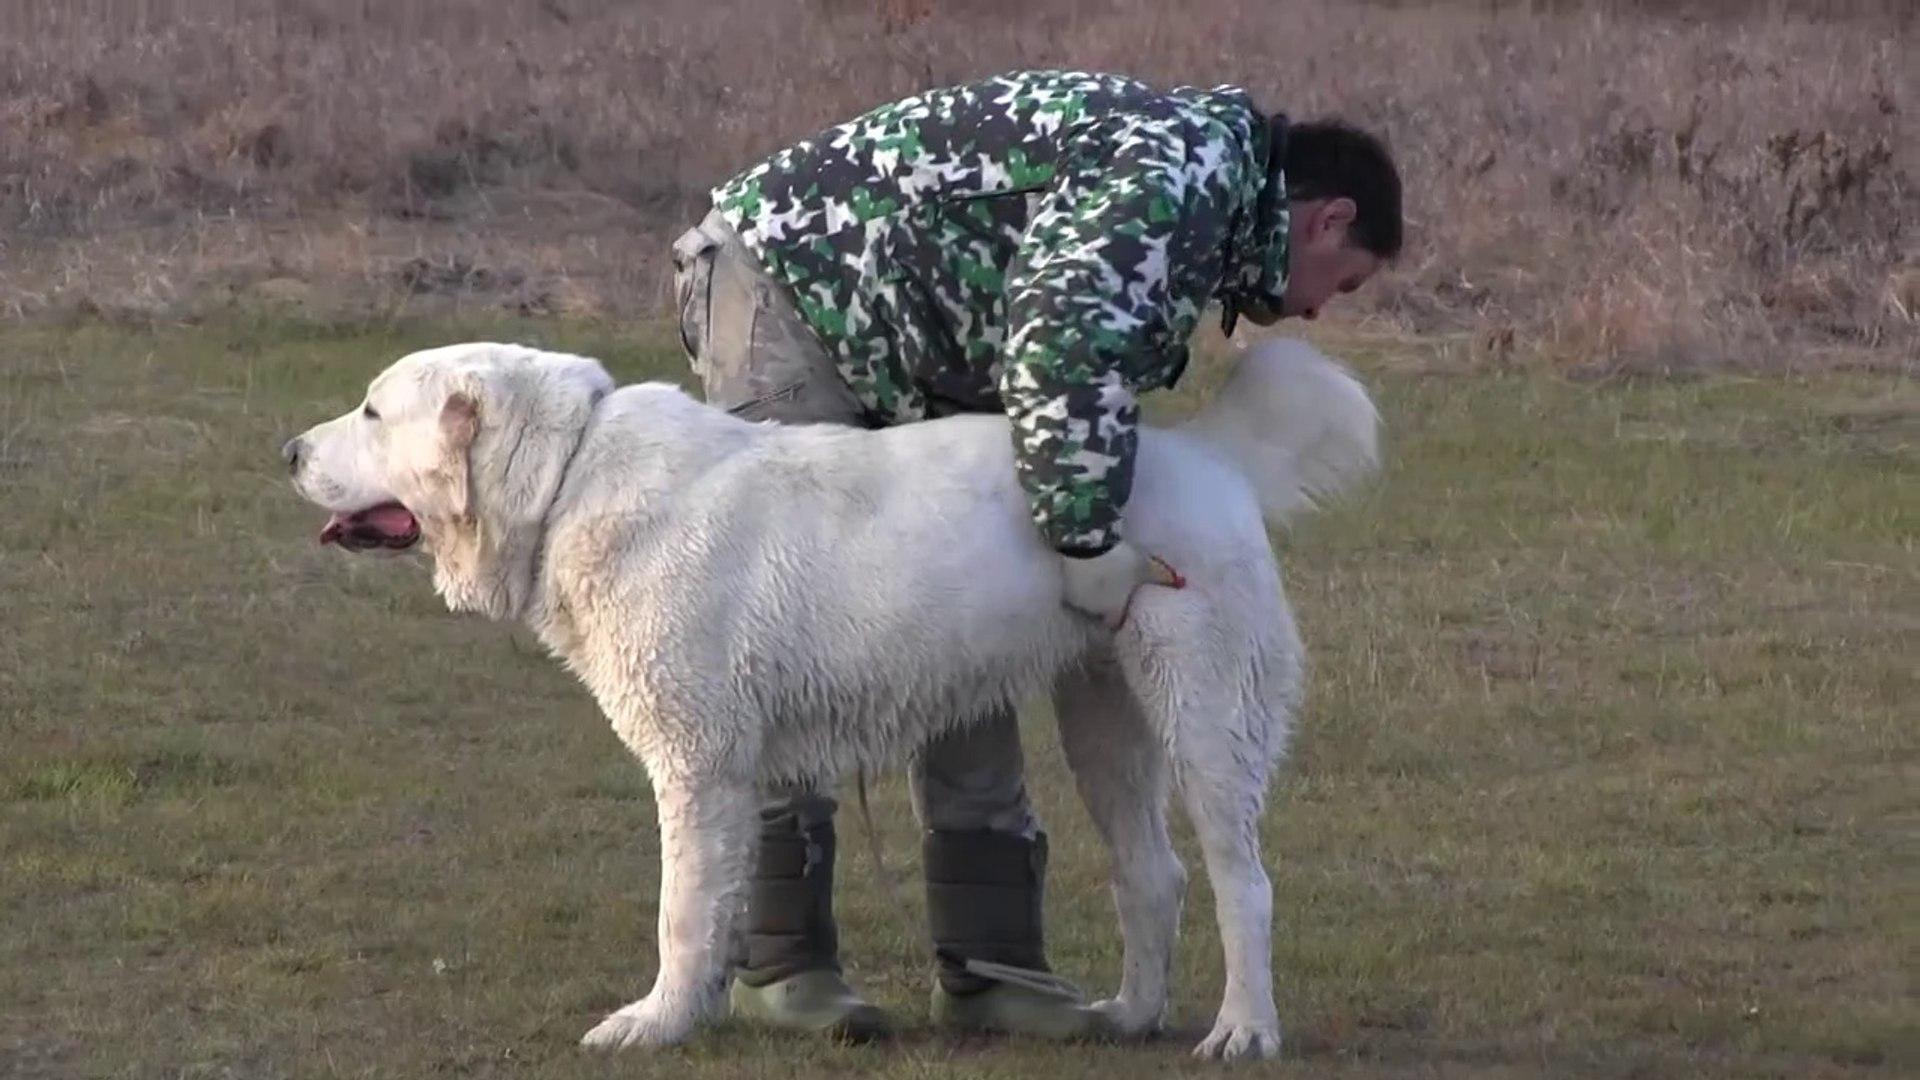 ALABAY COBAN KOPEGi OGLEN GEZiNTiSi - ALABAi SHEPHERD DOG